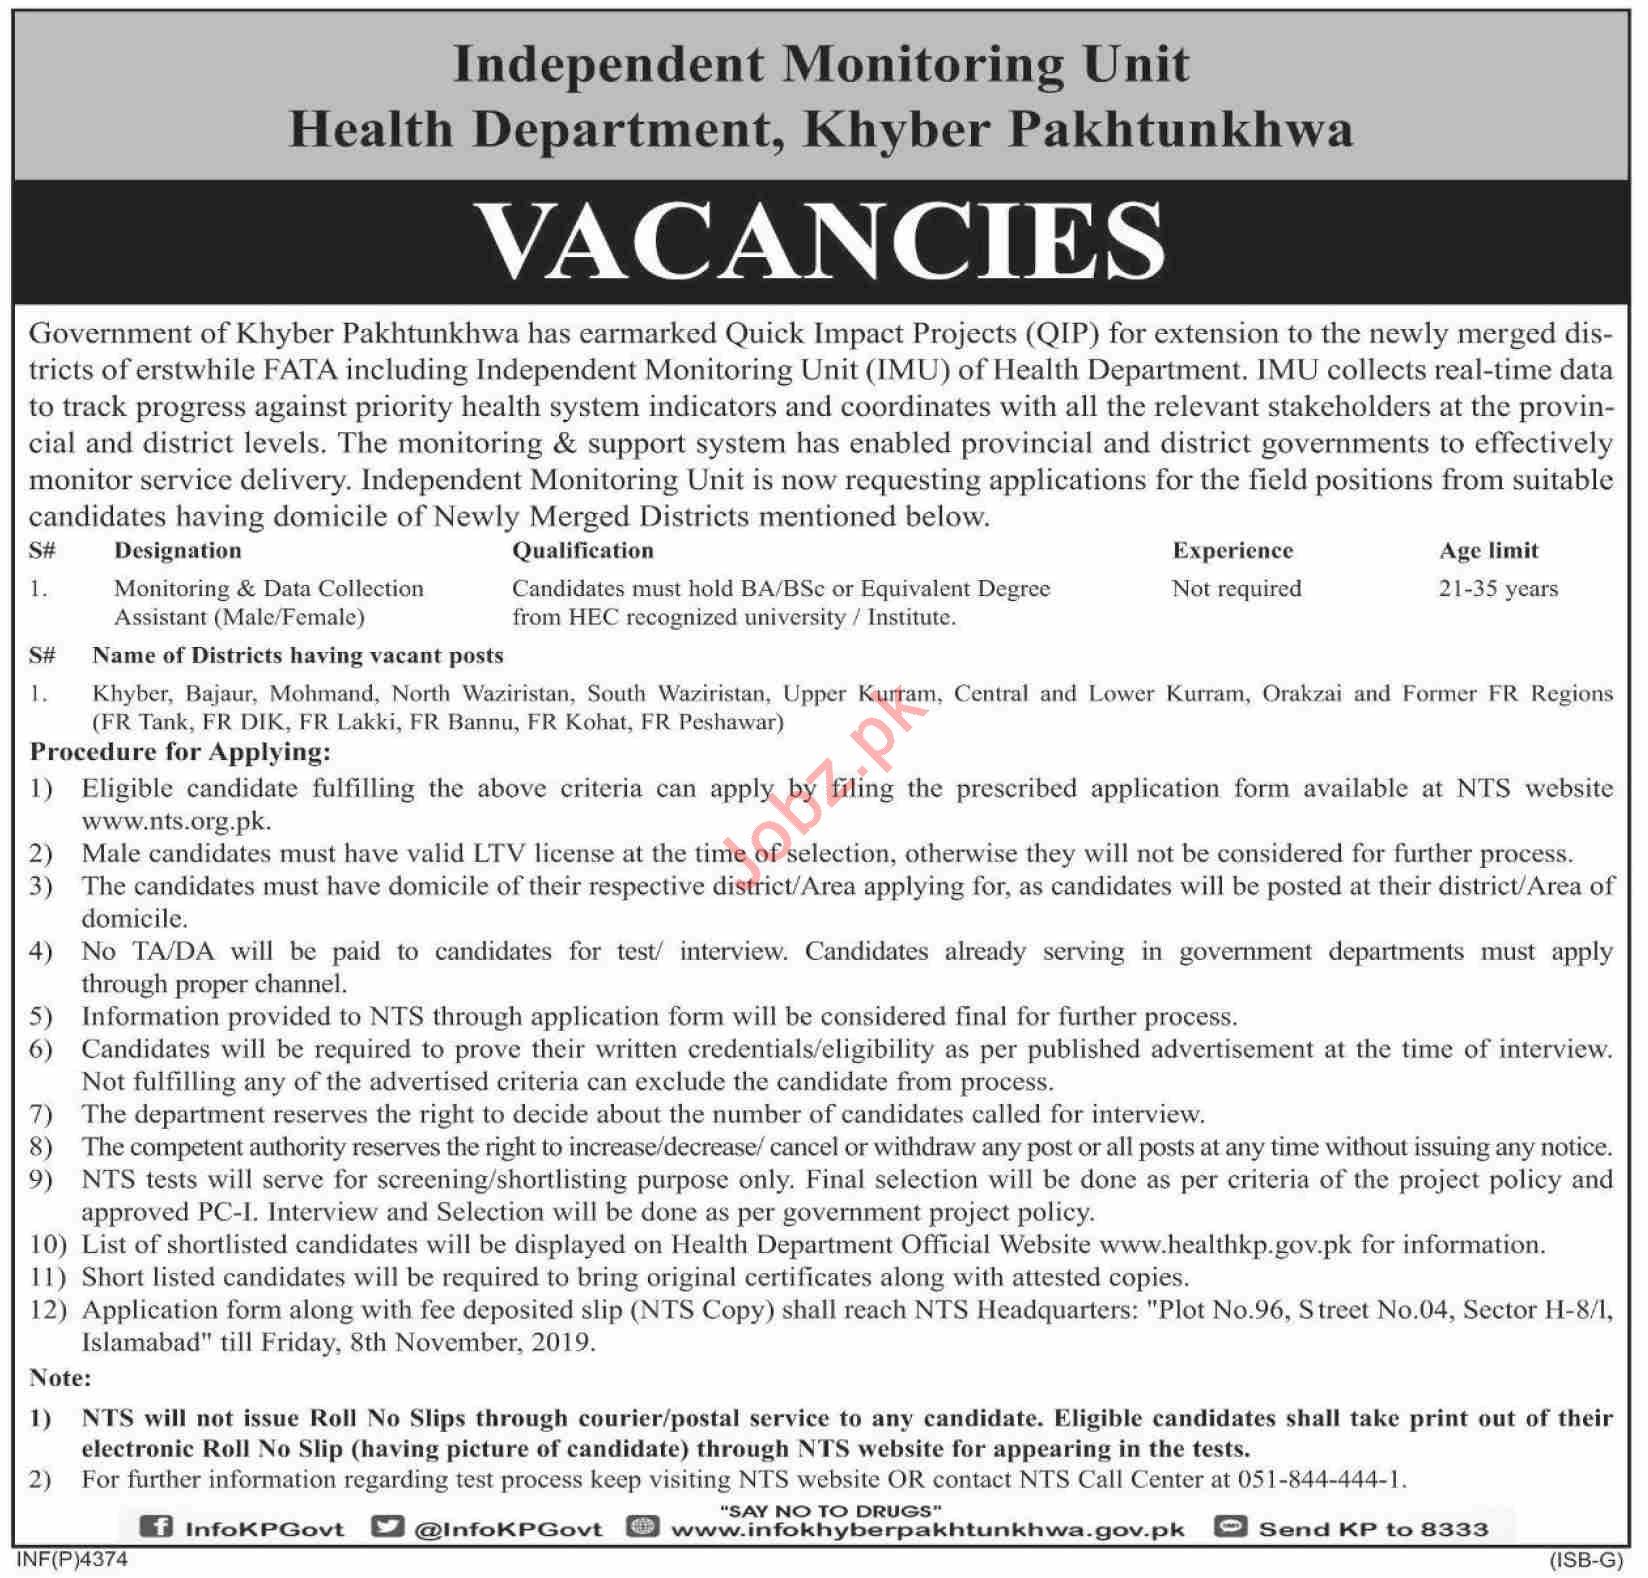 Independent Monitoring Unit Health Department Jobs via NTS